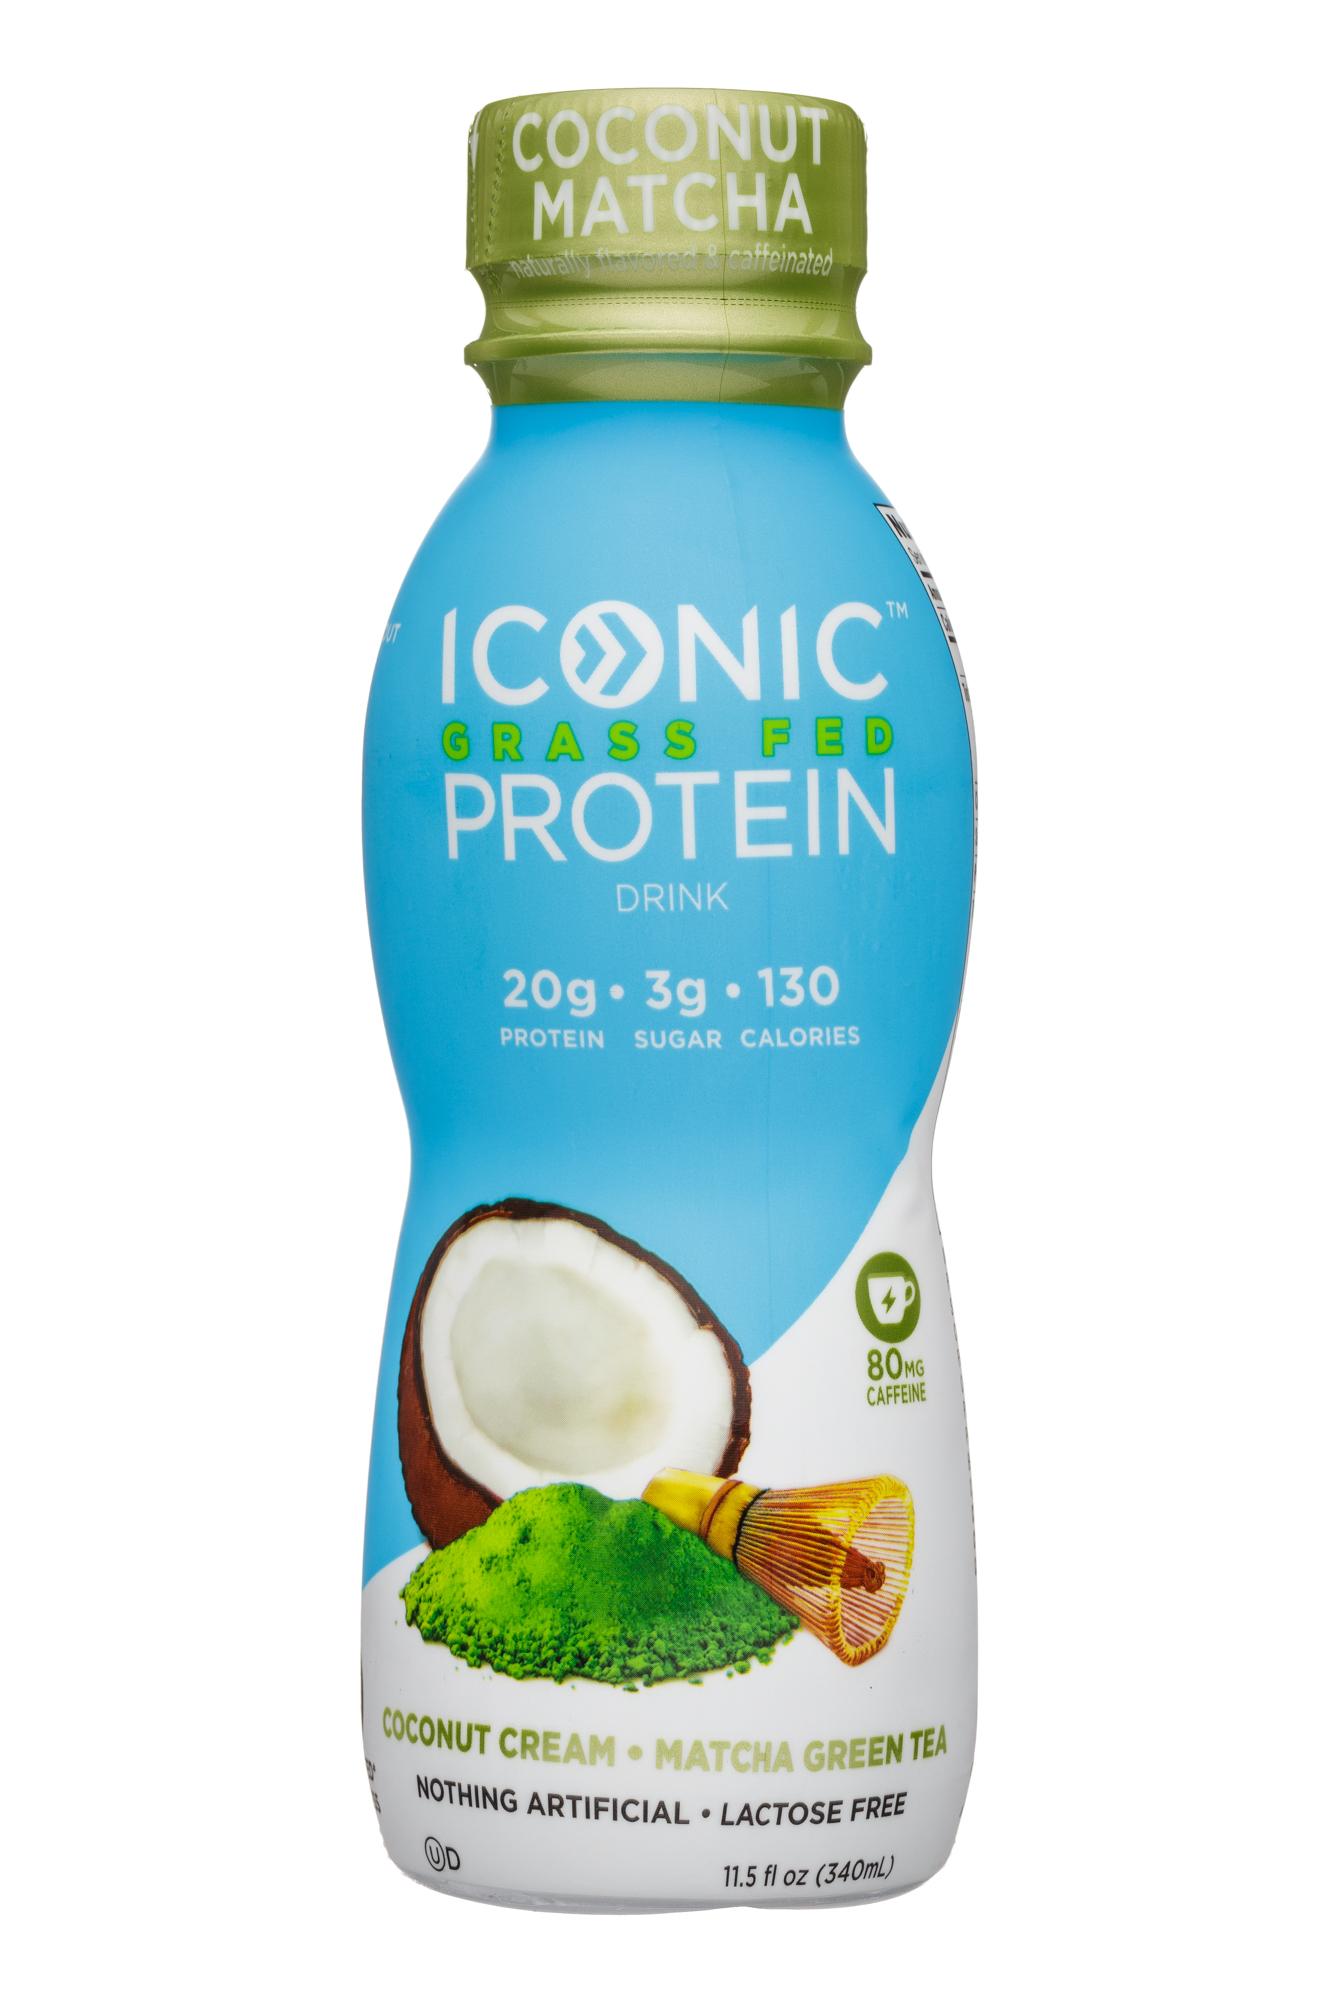 Iconic: Iconic-12oz-GrassFedProtein-CoconutCreamMatchaGreenTea-Front